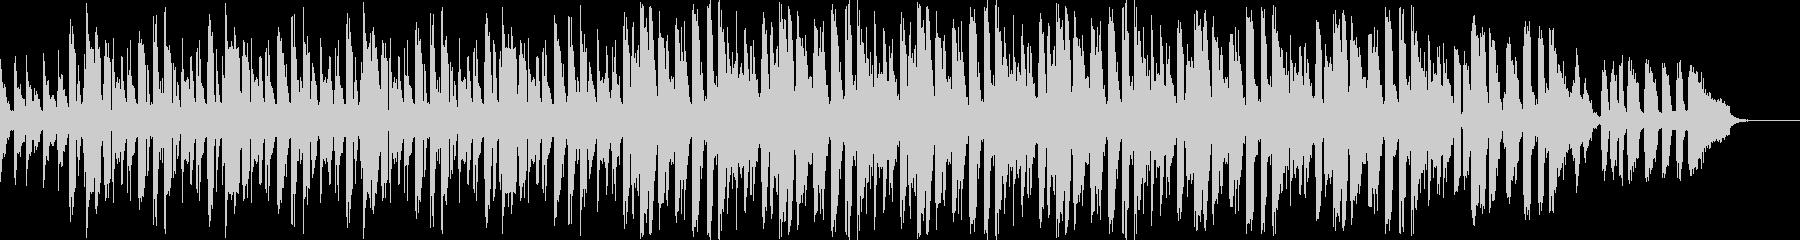 bpm128 ハイテンポスウィングバージの未再生の波形